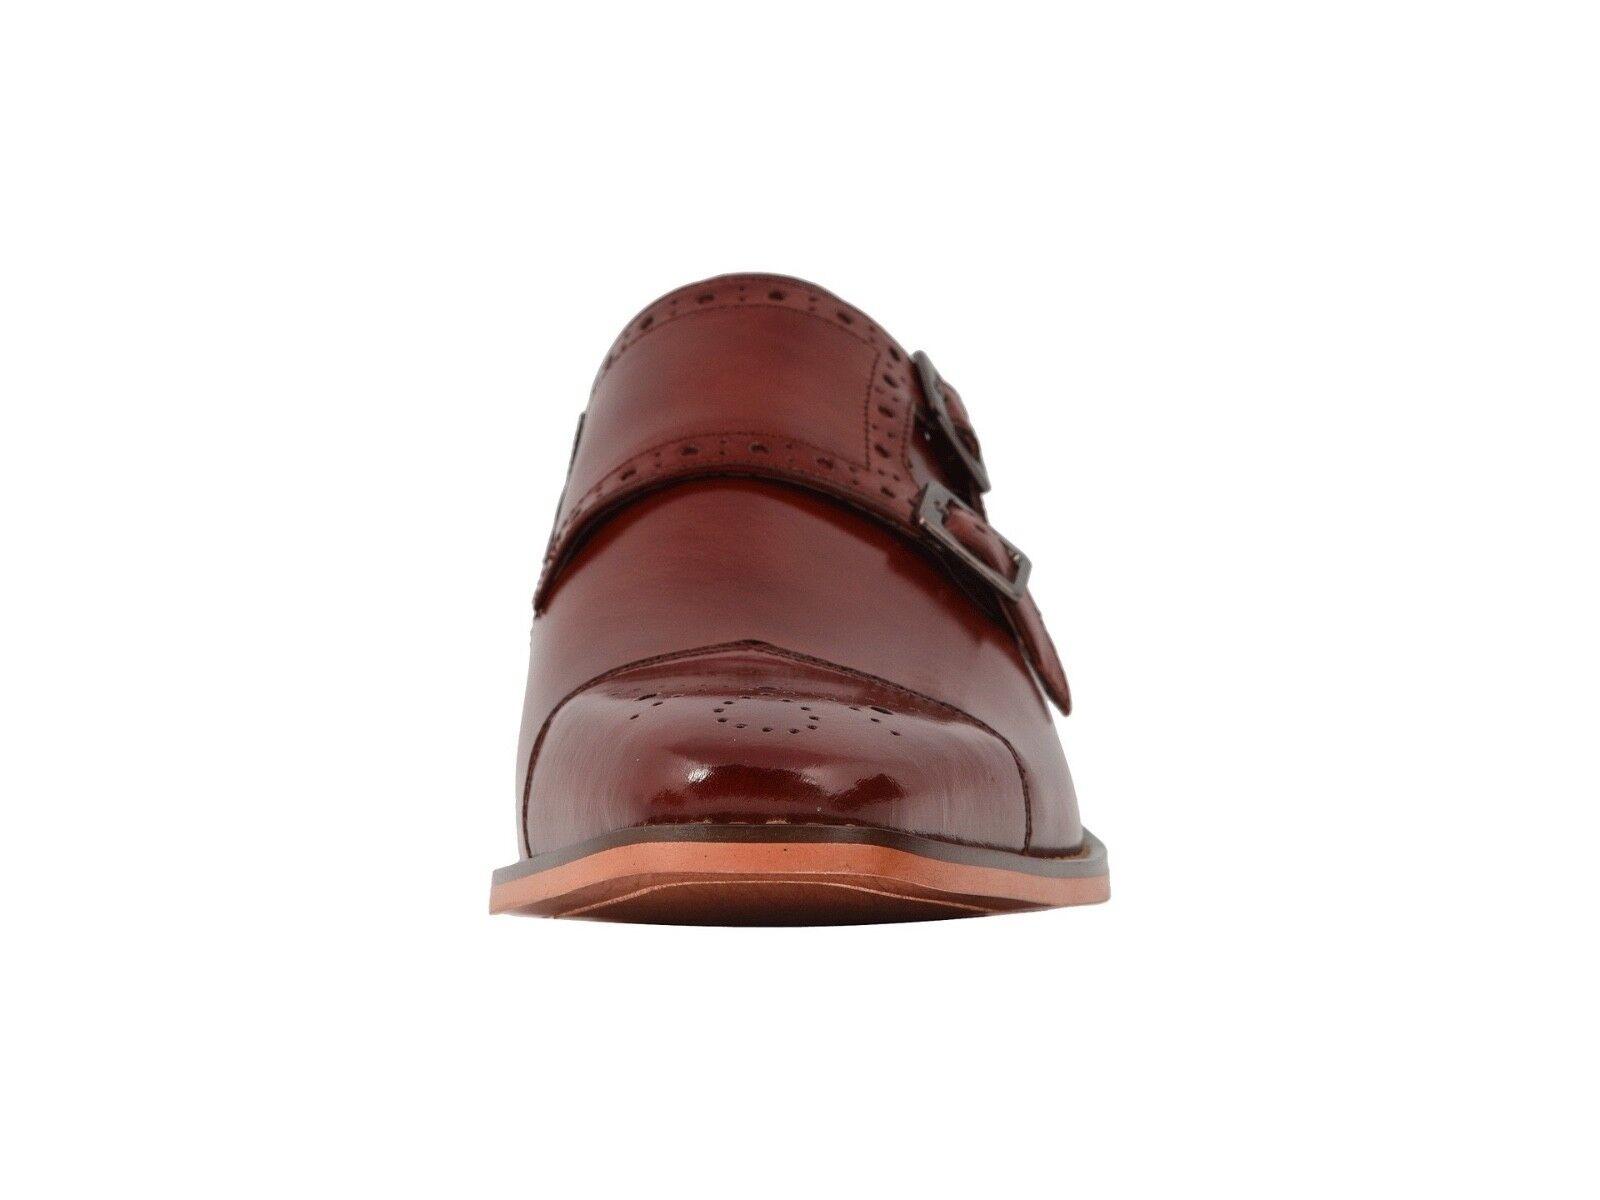 Stacy Adams Tayton Tayton Tayton Men's Cognac Double Monk Strap Cap Toe Dress scarpe 25194-221 91000f